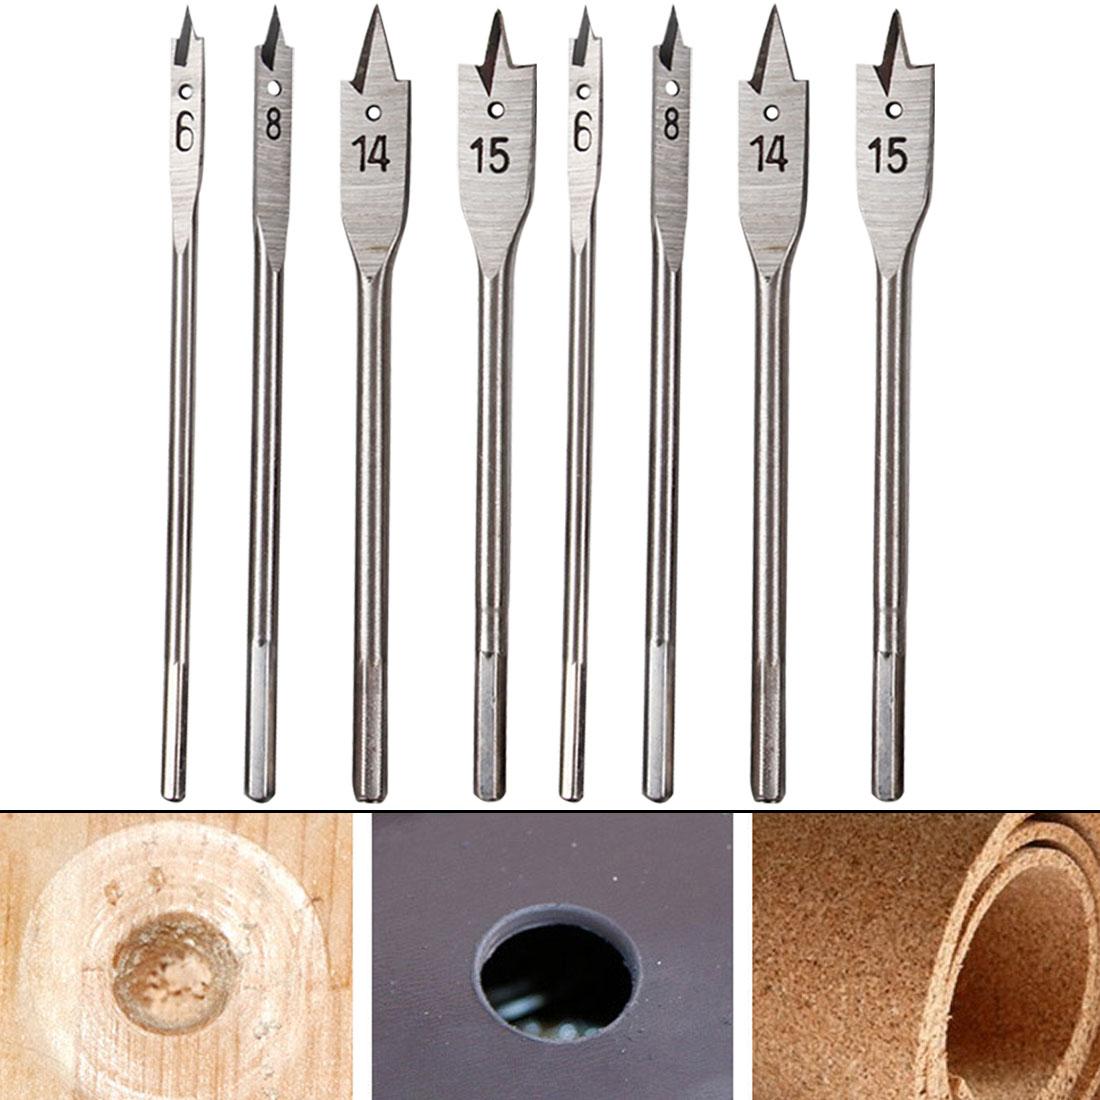 6-45mm Hand Drill Bits Flat Drills High-carbon Steel Wood Woodworking Tool